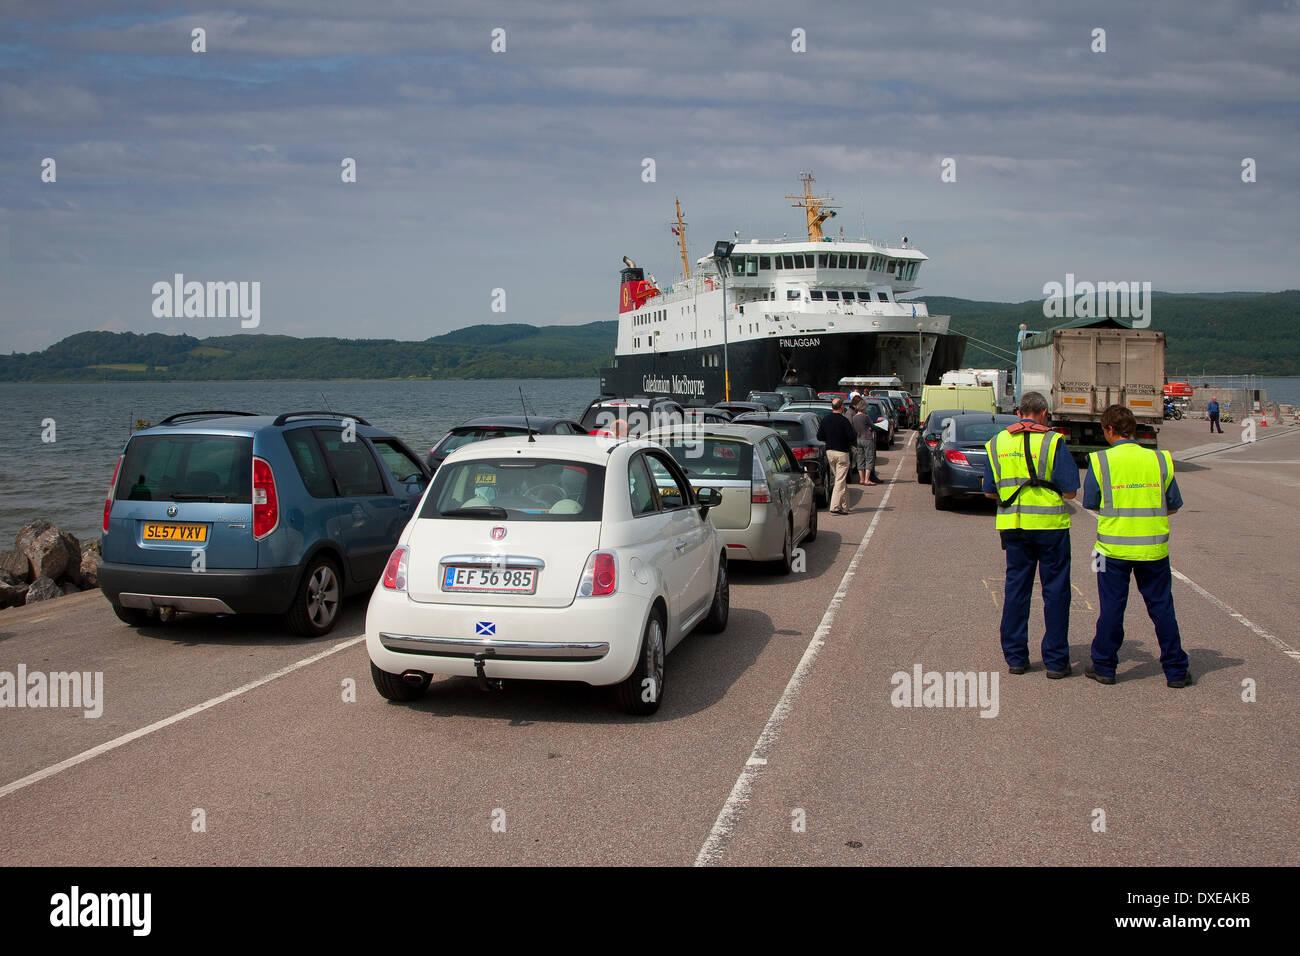 Voitures en cours de chargement sur Caledoniann MacBrayne navire 'MV' Finlaggan à Kennicraig Pier, West Loch Tarbert. Photo Stock